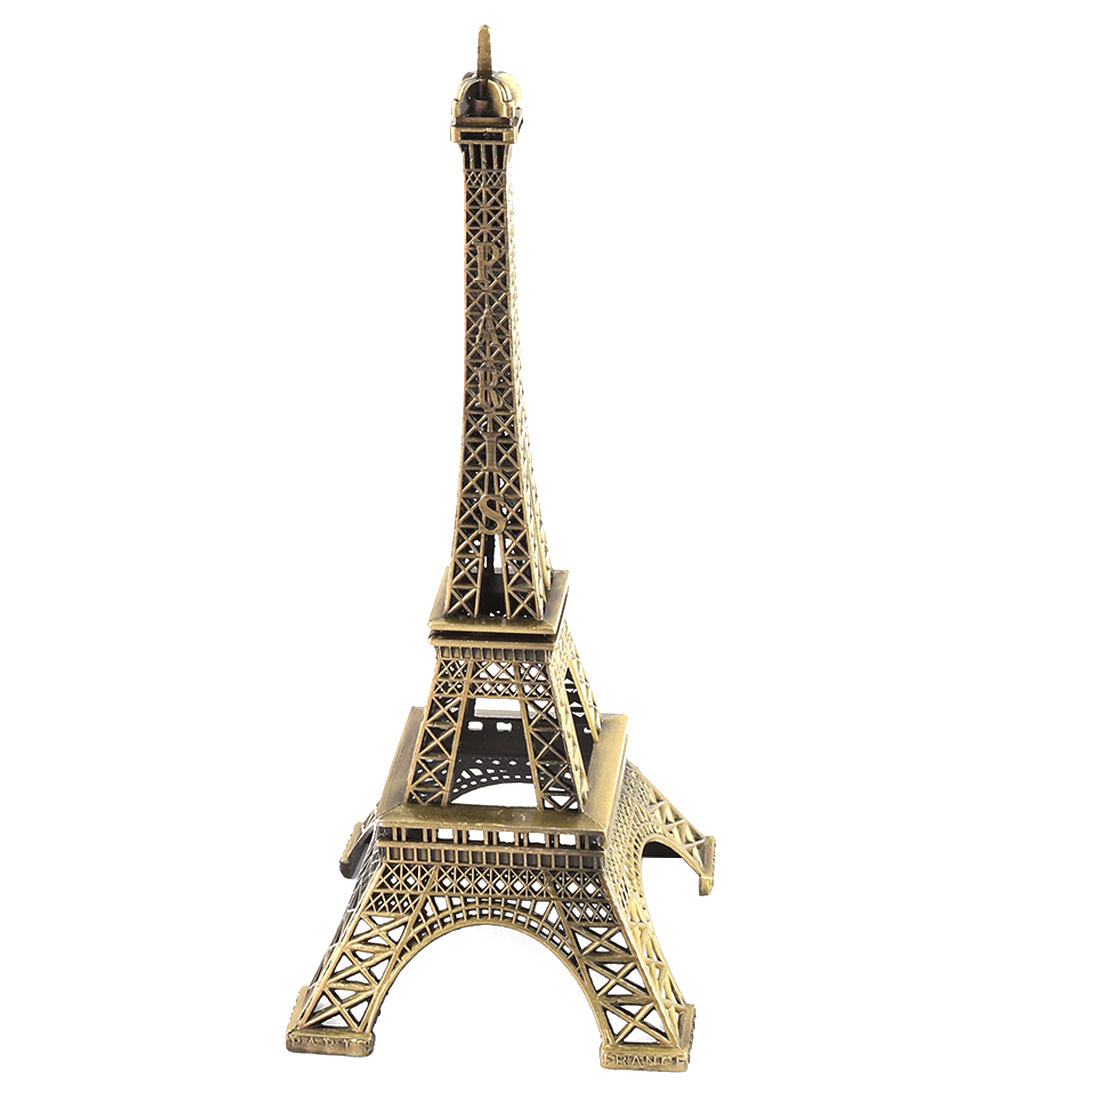 Family Metal Desktop Table Decor Eiffel Tower Model Bronze Tone 10 x 10 x 25.3cm